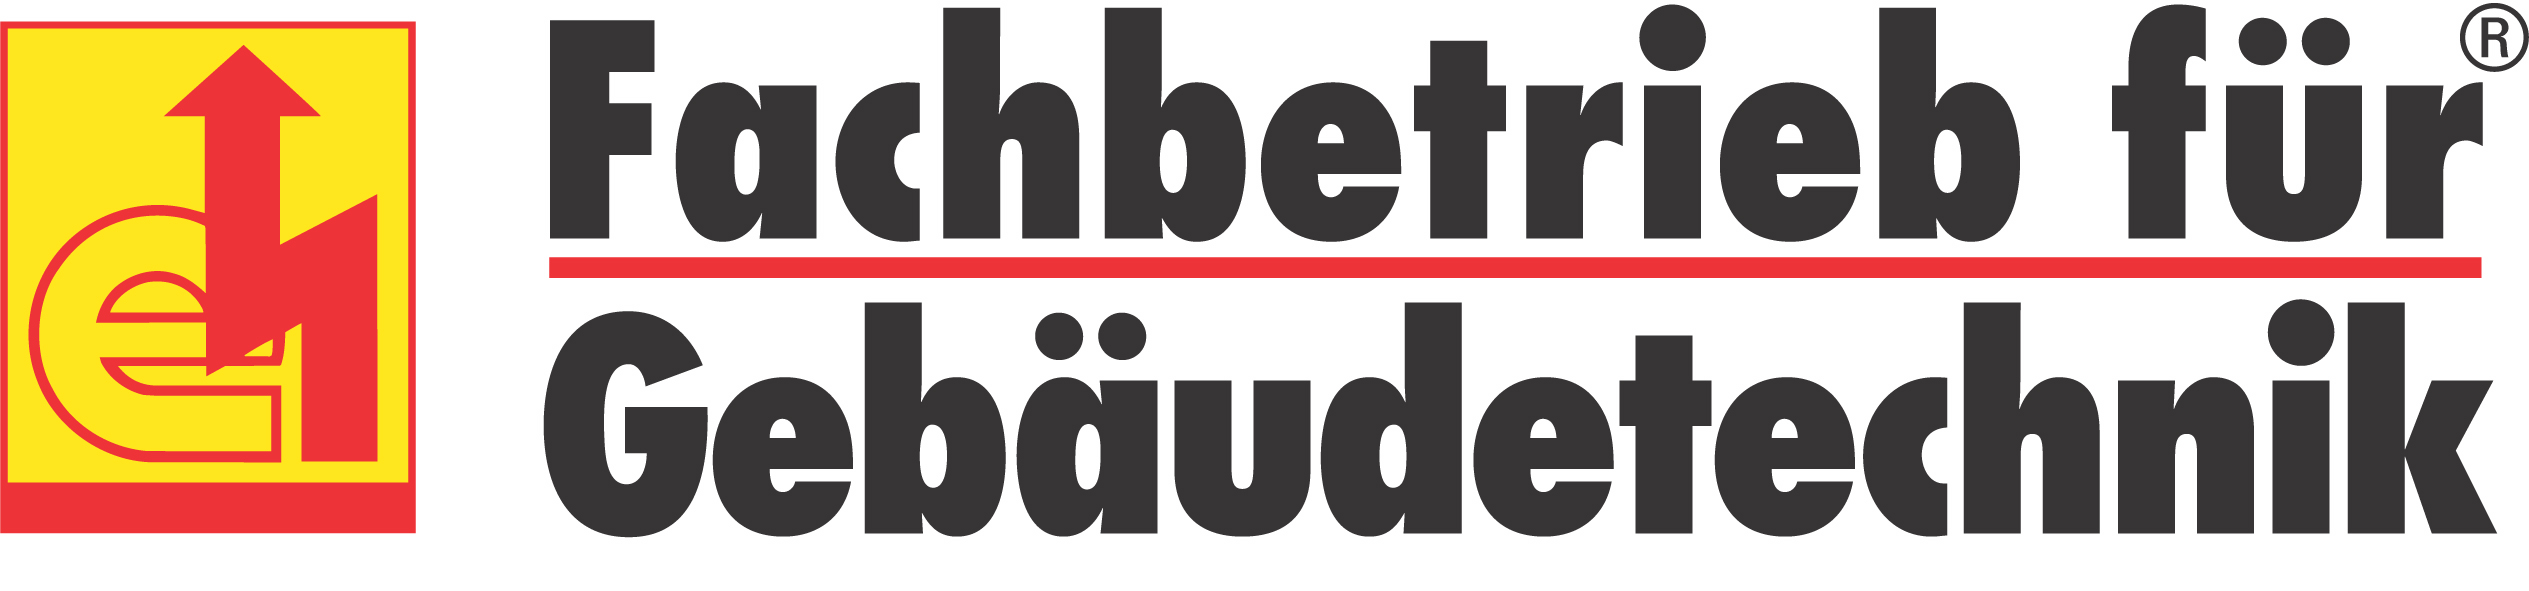 Gebäudetechnik_logo